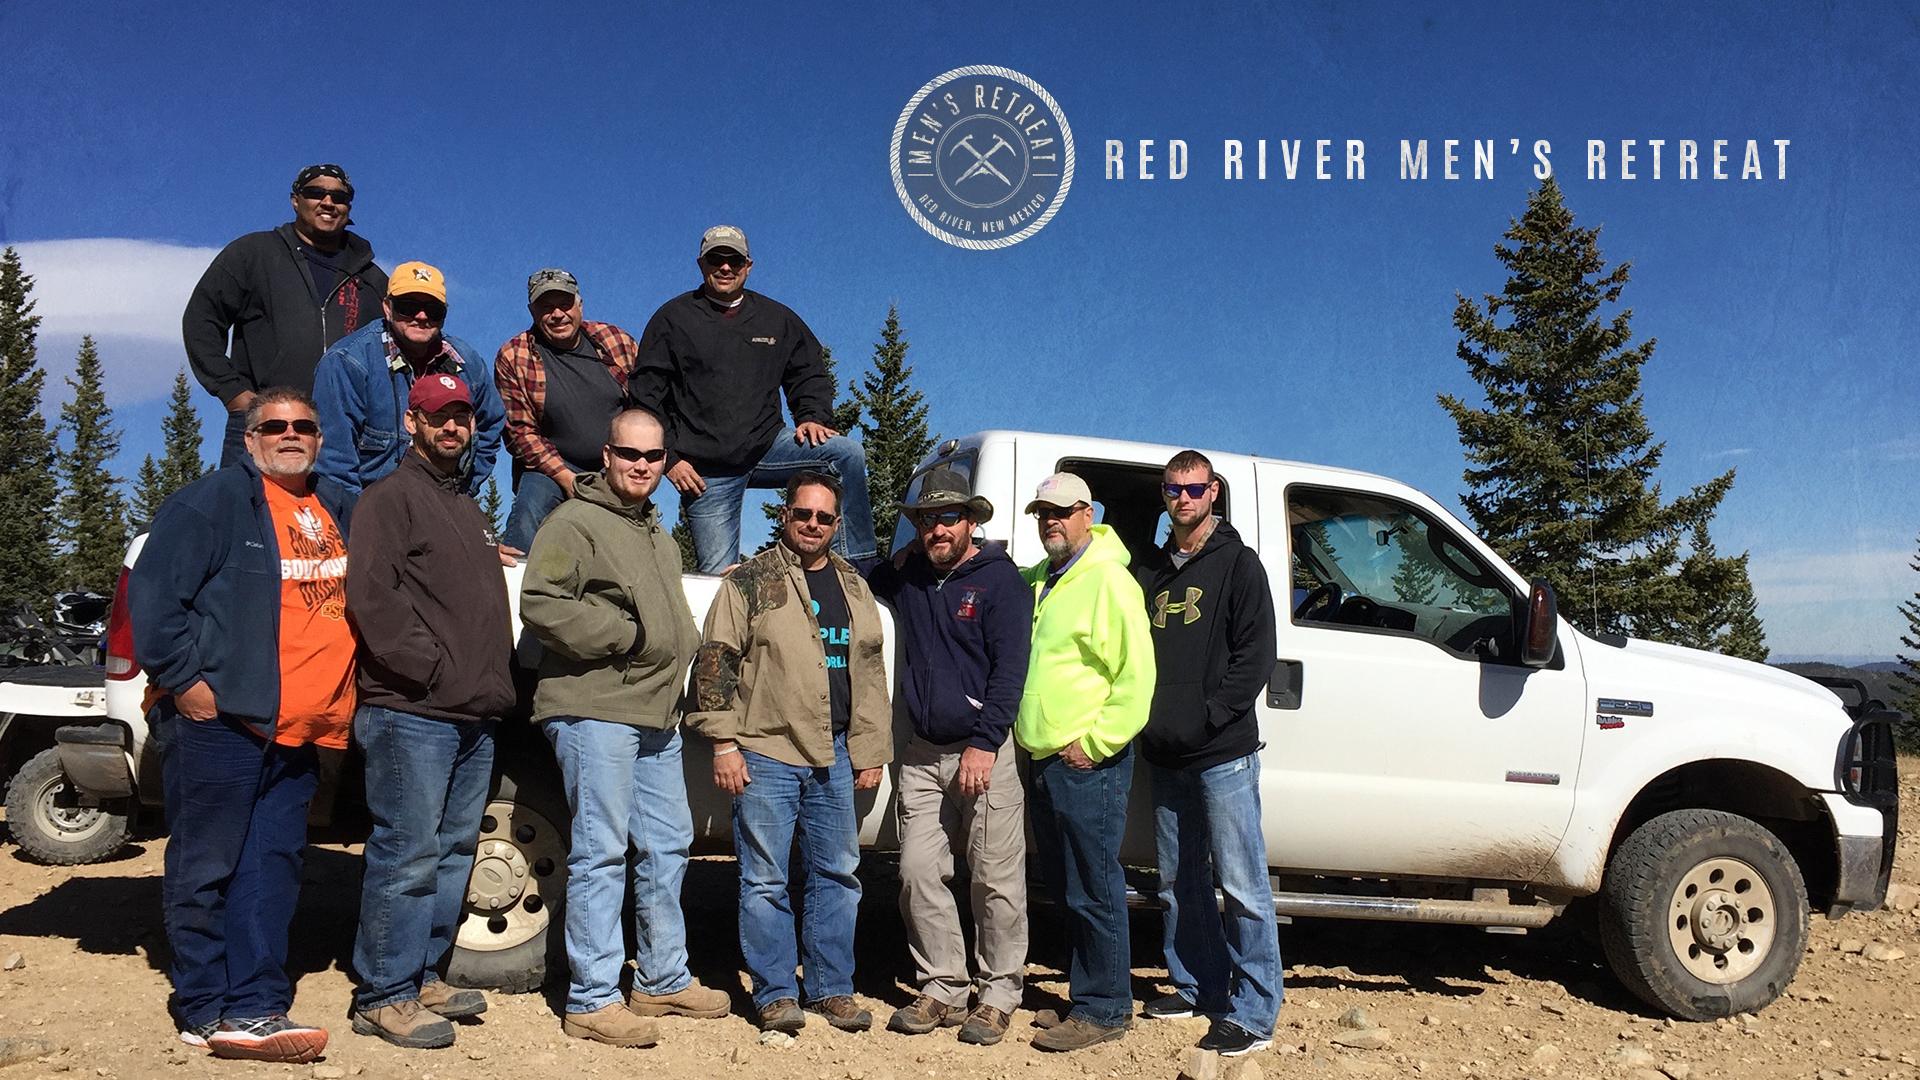 Red river retreat   pickup